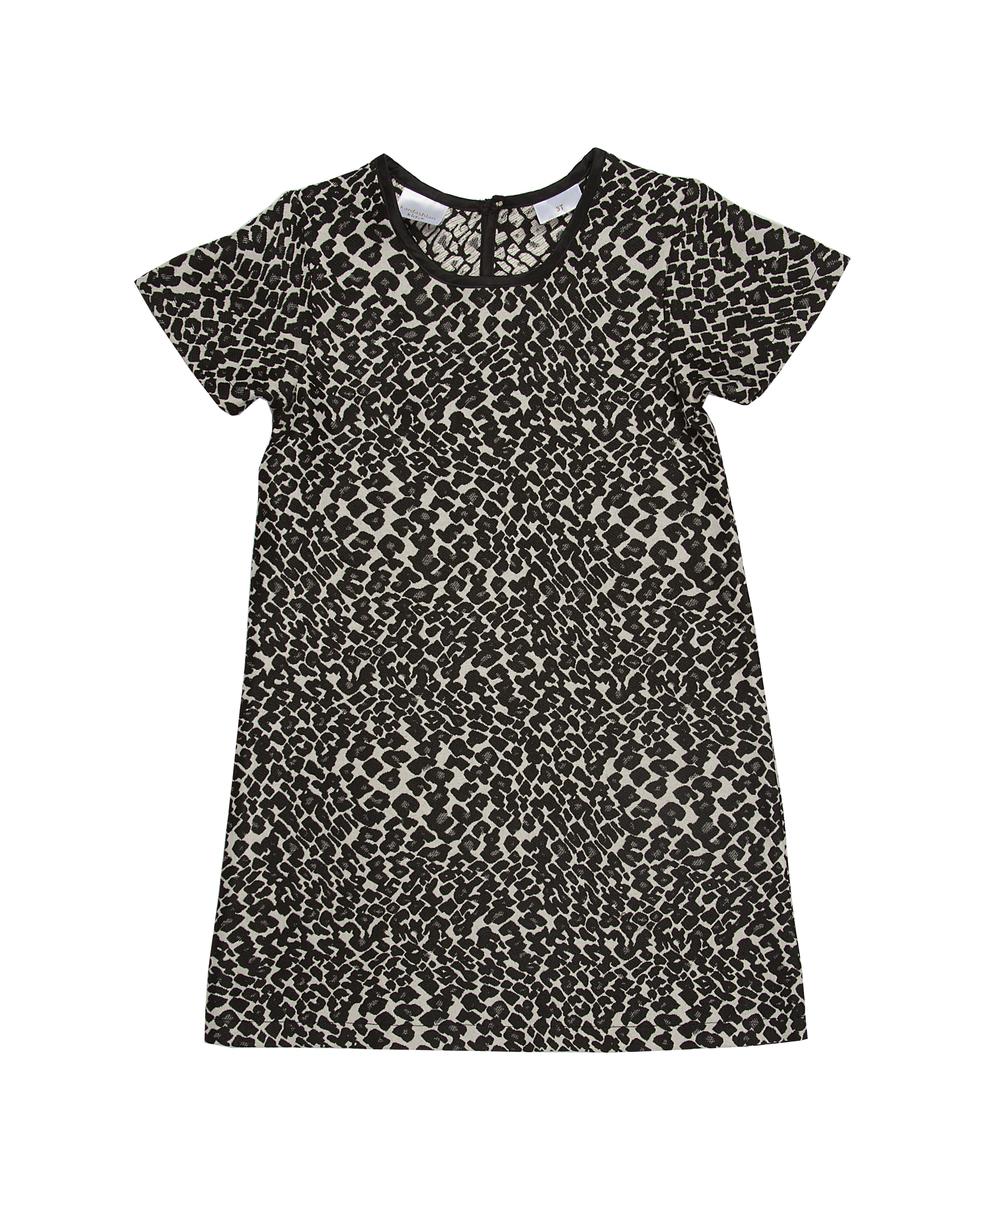 Animal Print Dress 3T.jpg